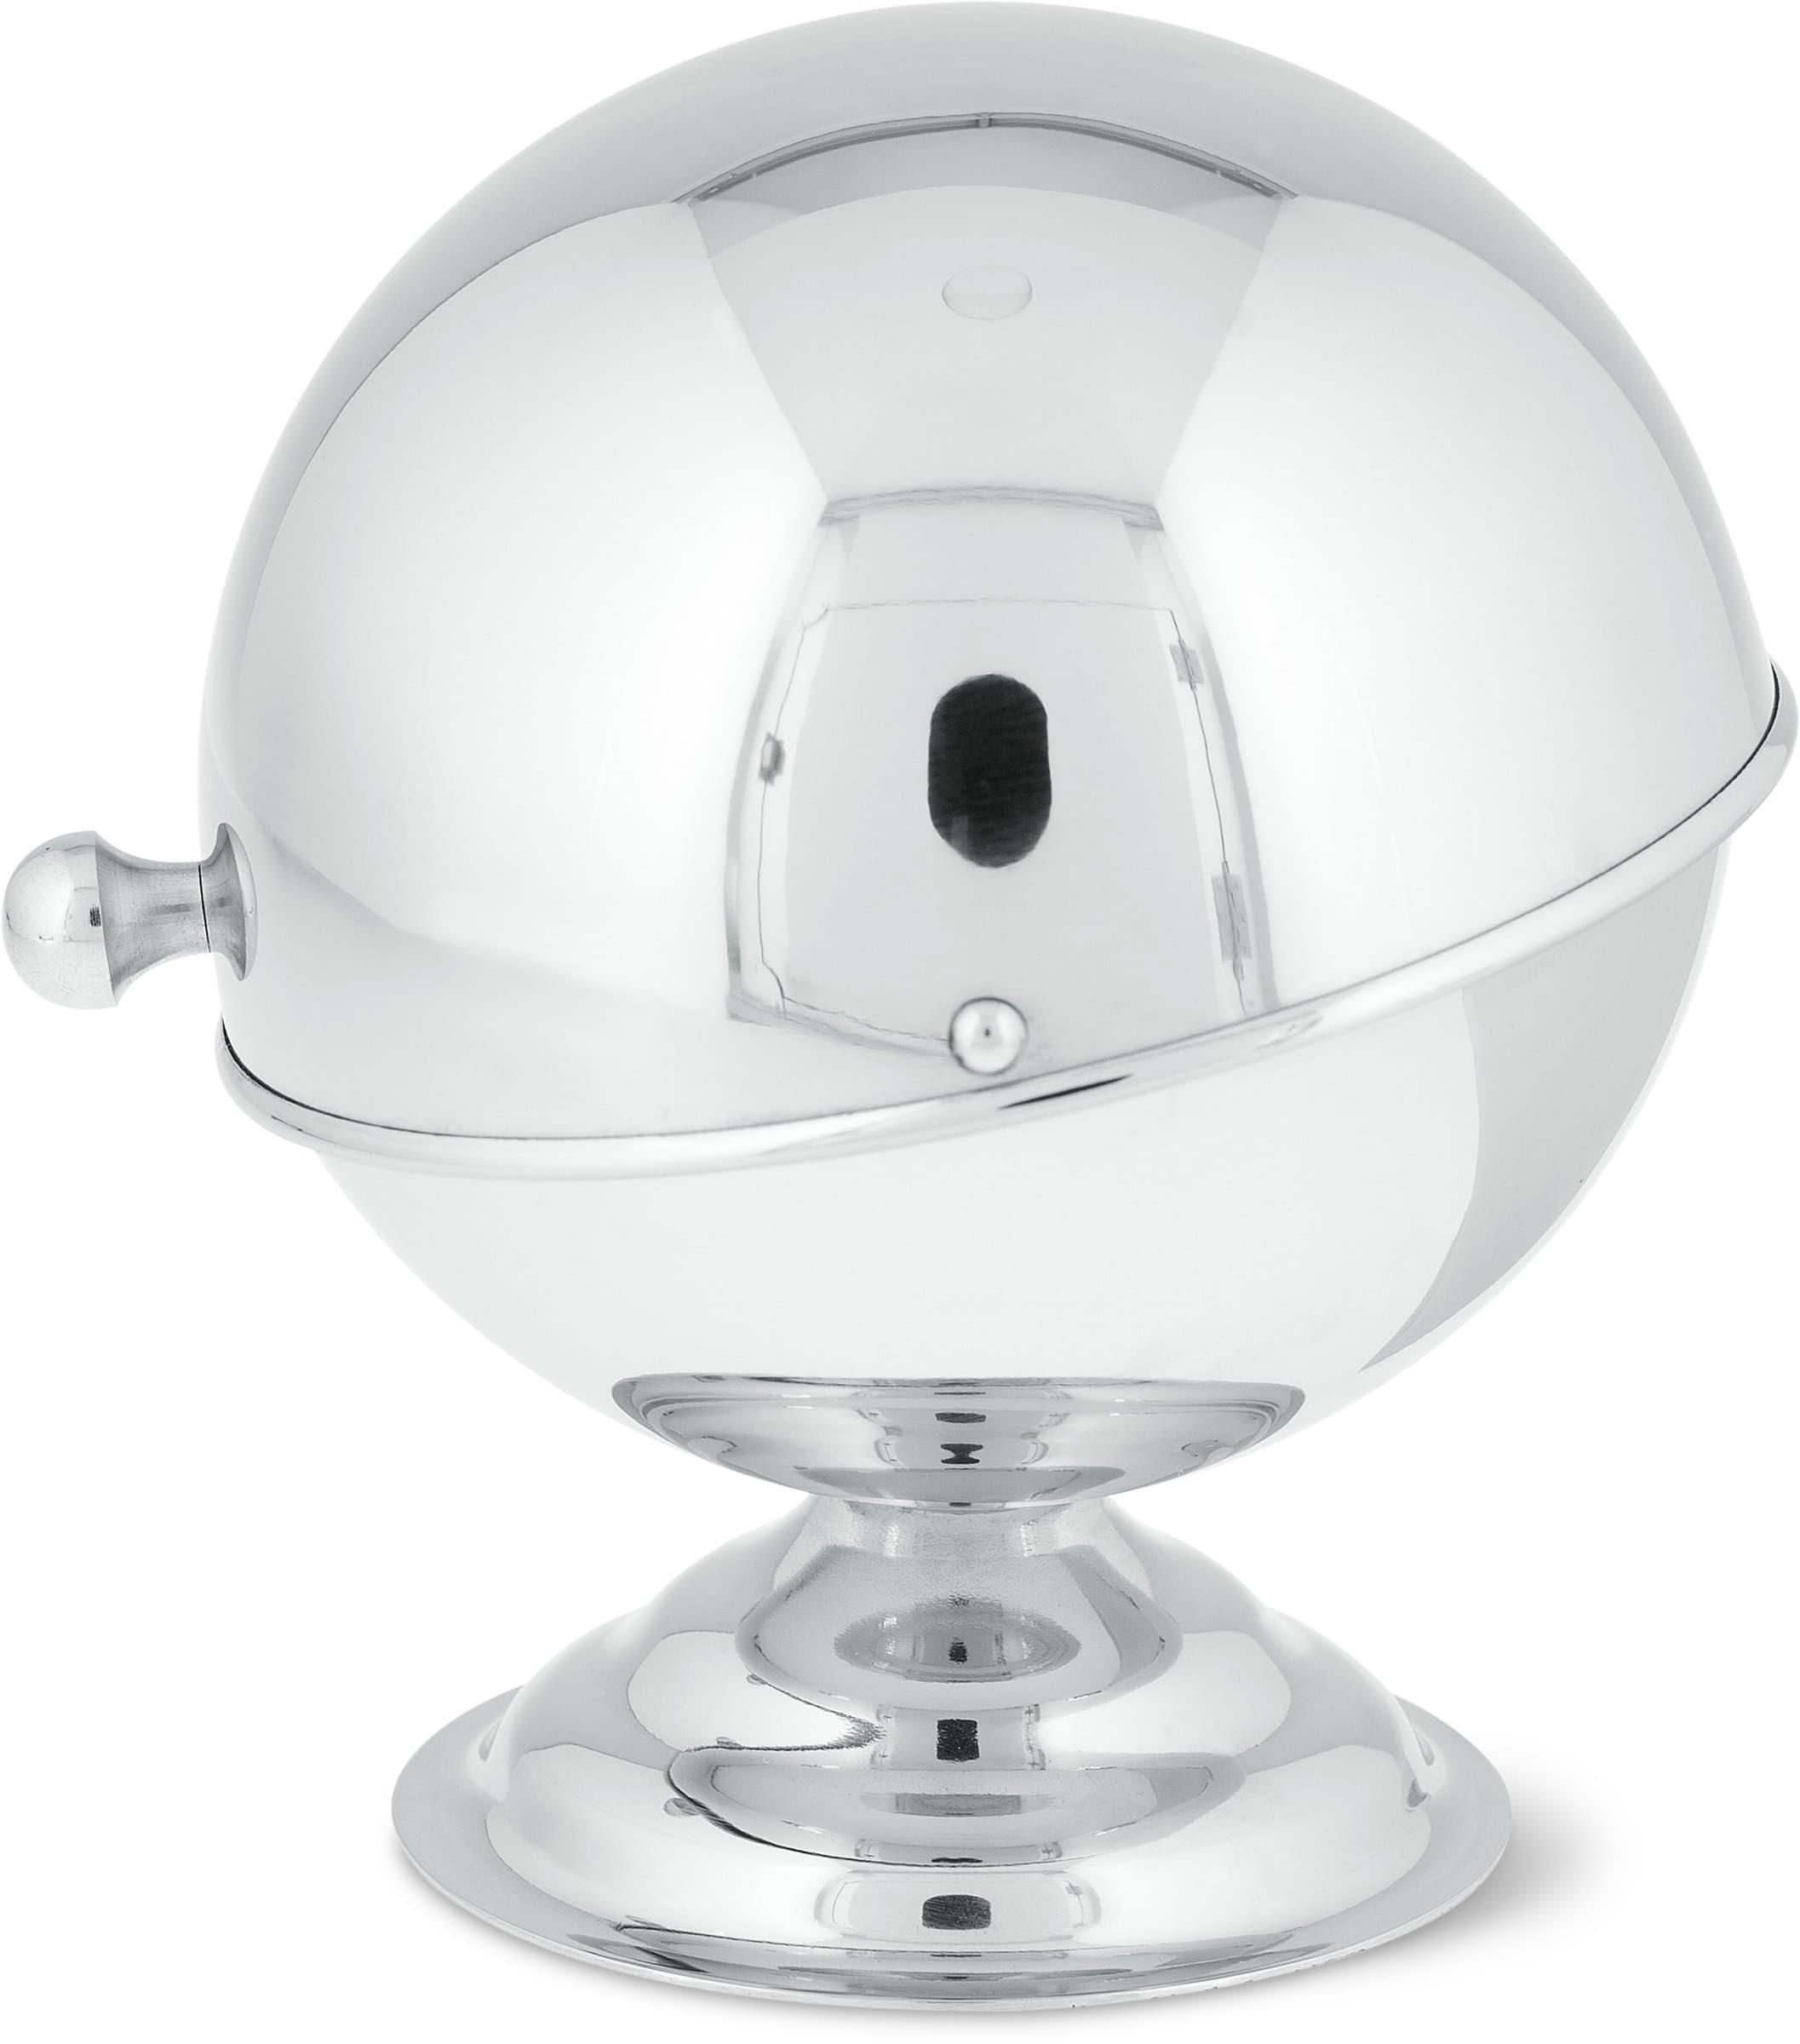 Cucina & Tavola Sucrier en forme de boule